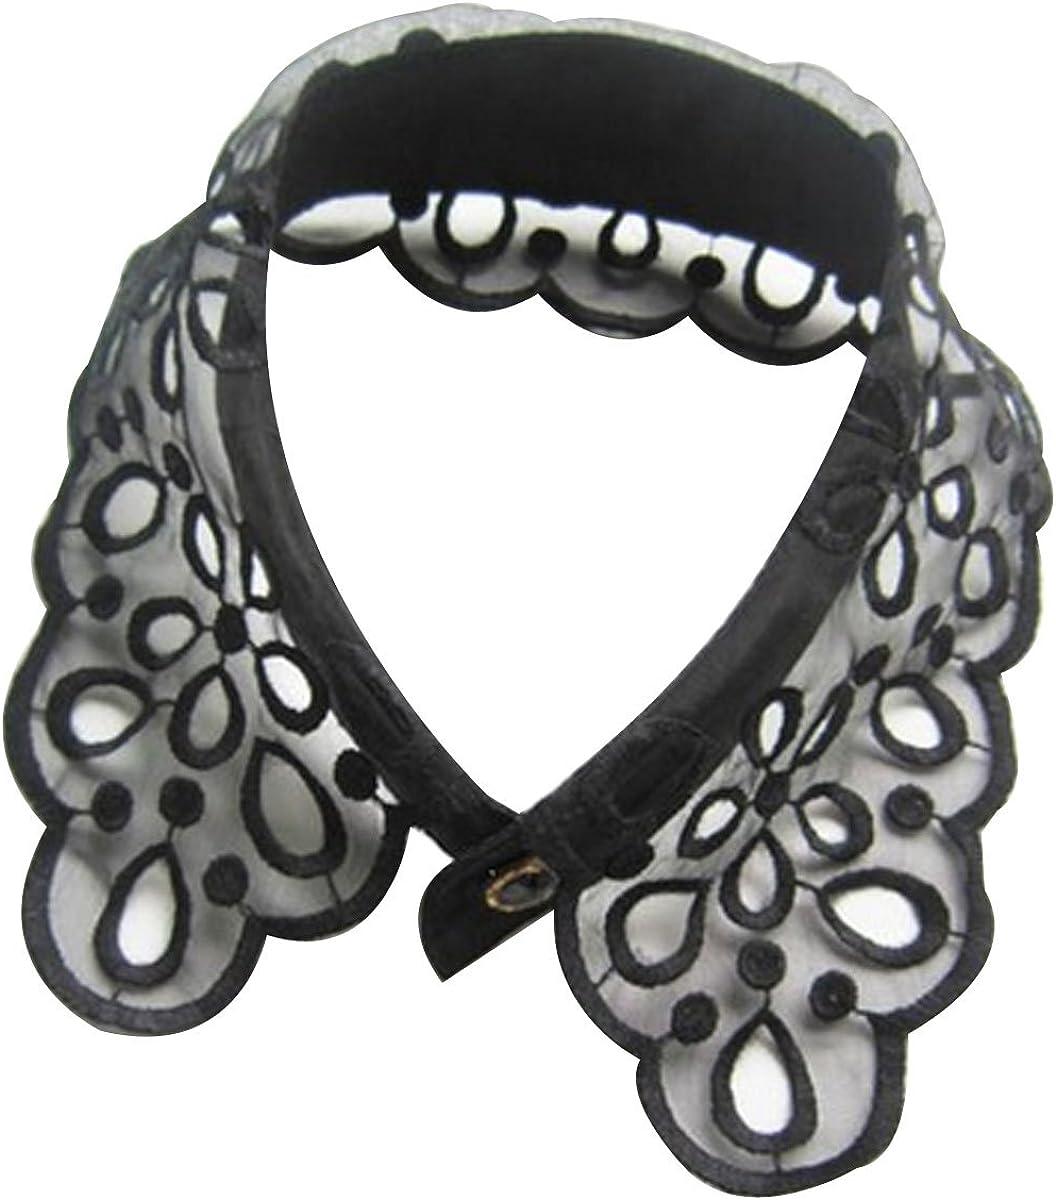 Wrapables Black Romantic Floral Lace Collar Necklace